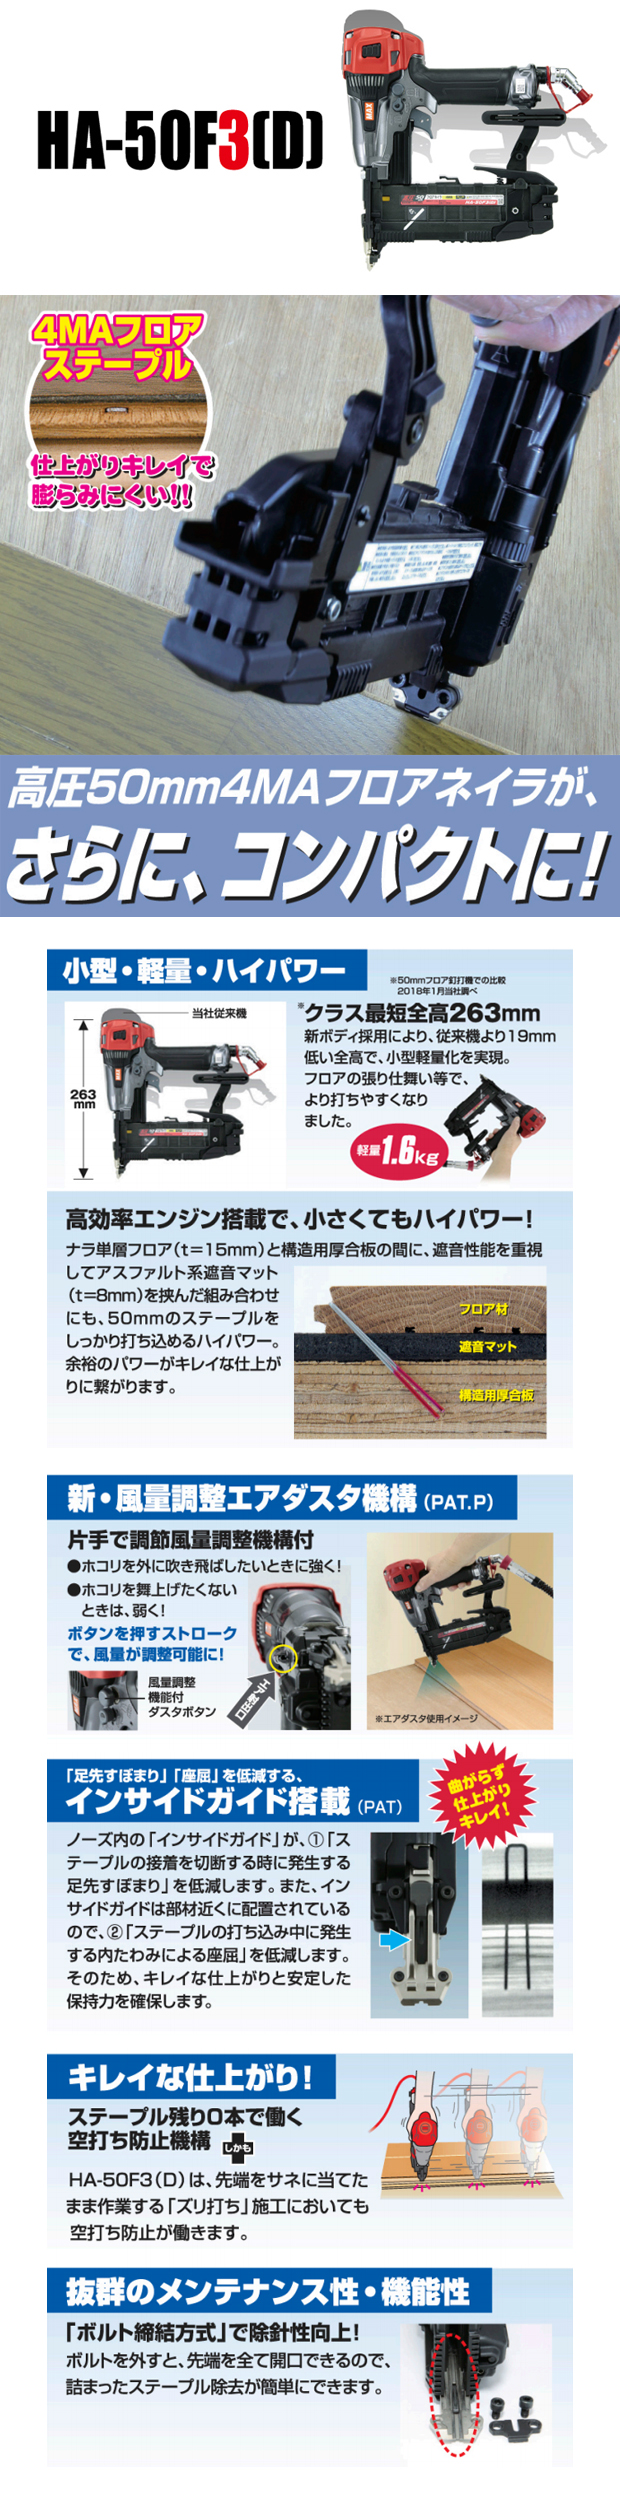 MAX 高圧ステープル用エアネイラ HA-50F3(D)